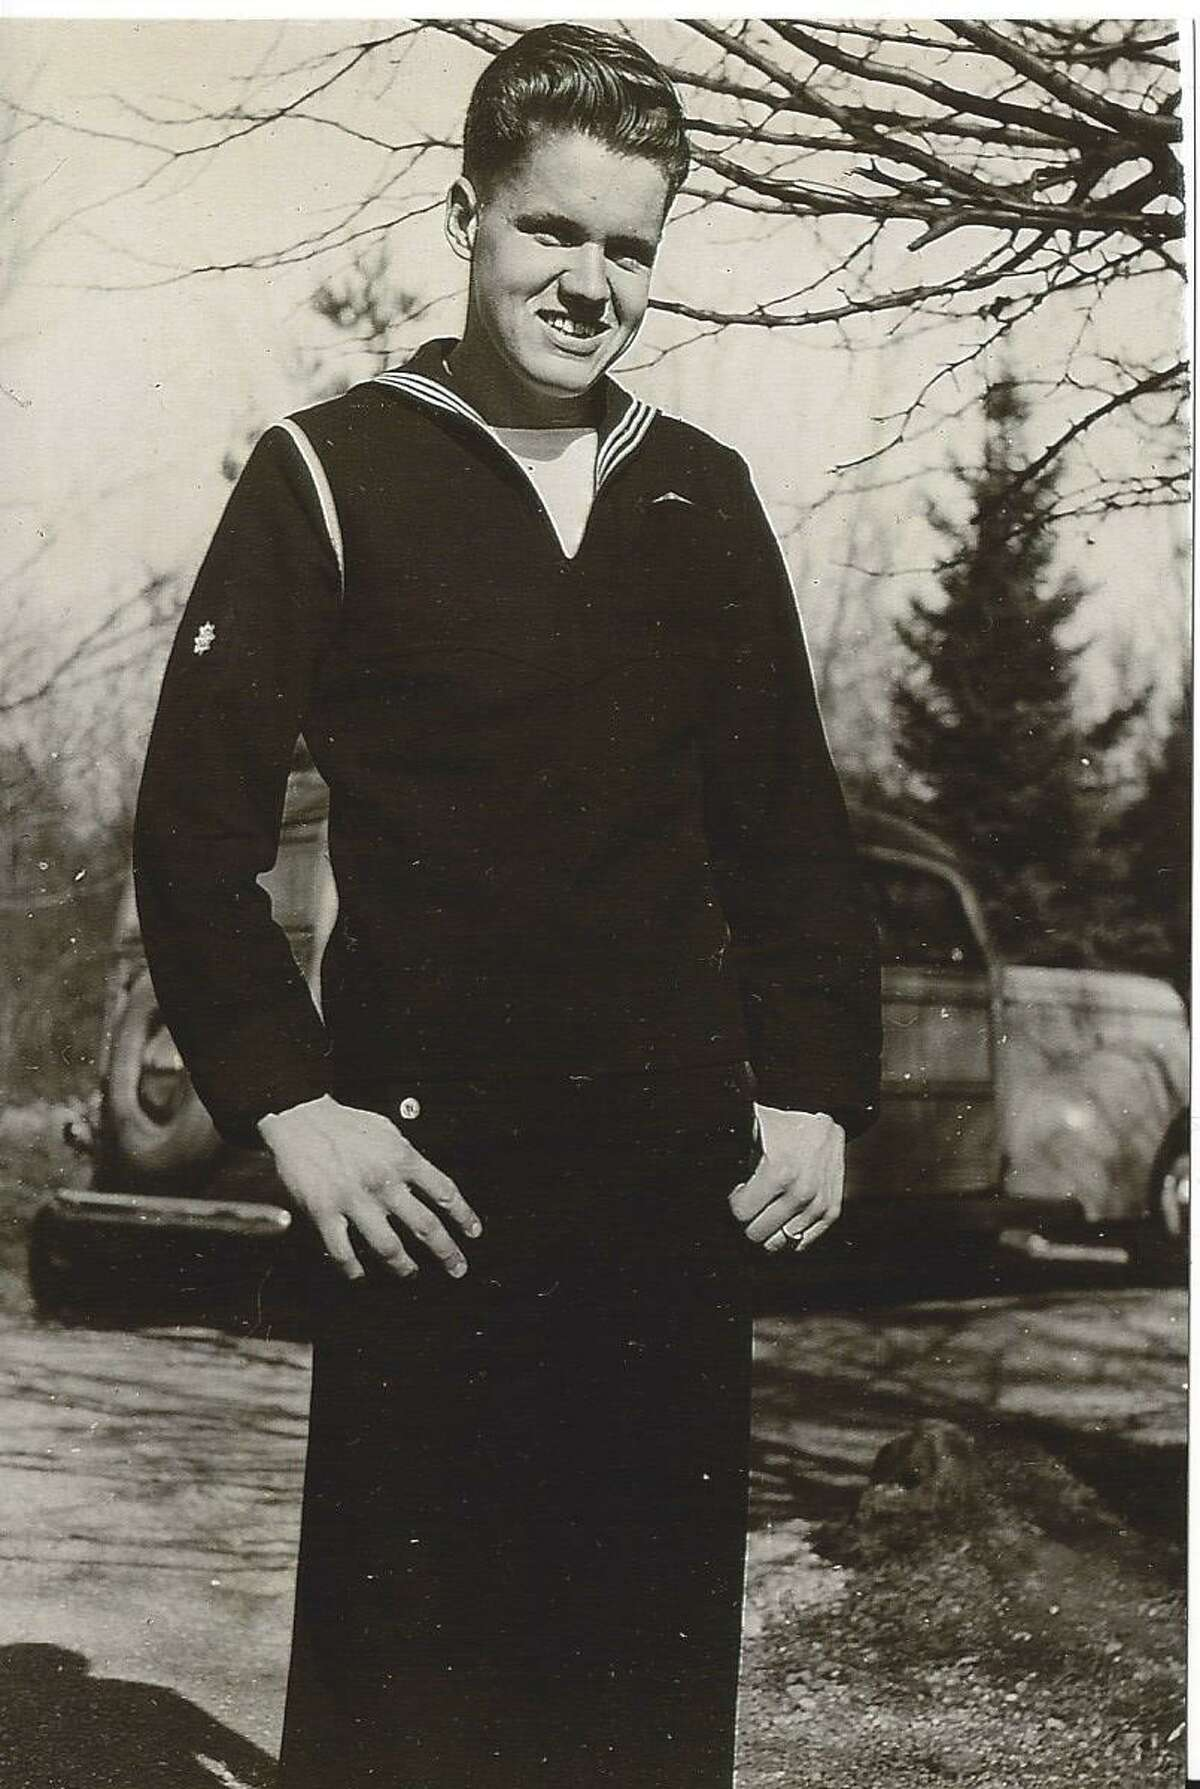 William Friend Emery dressed in his Navy blue uniform in spring 1945.